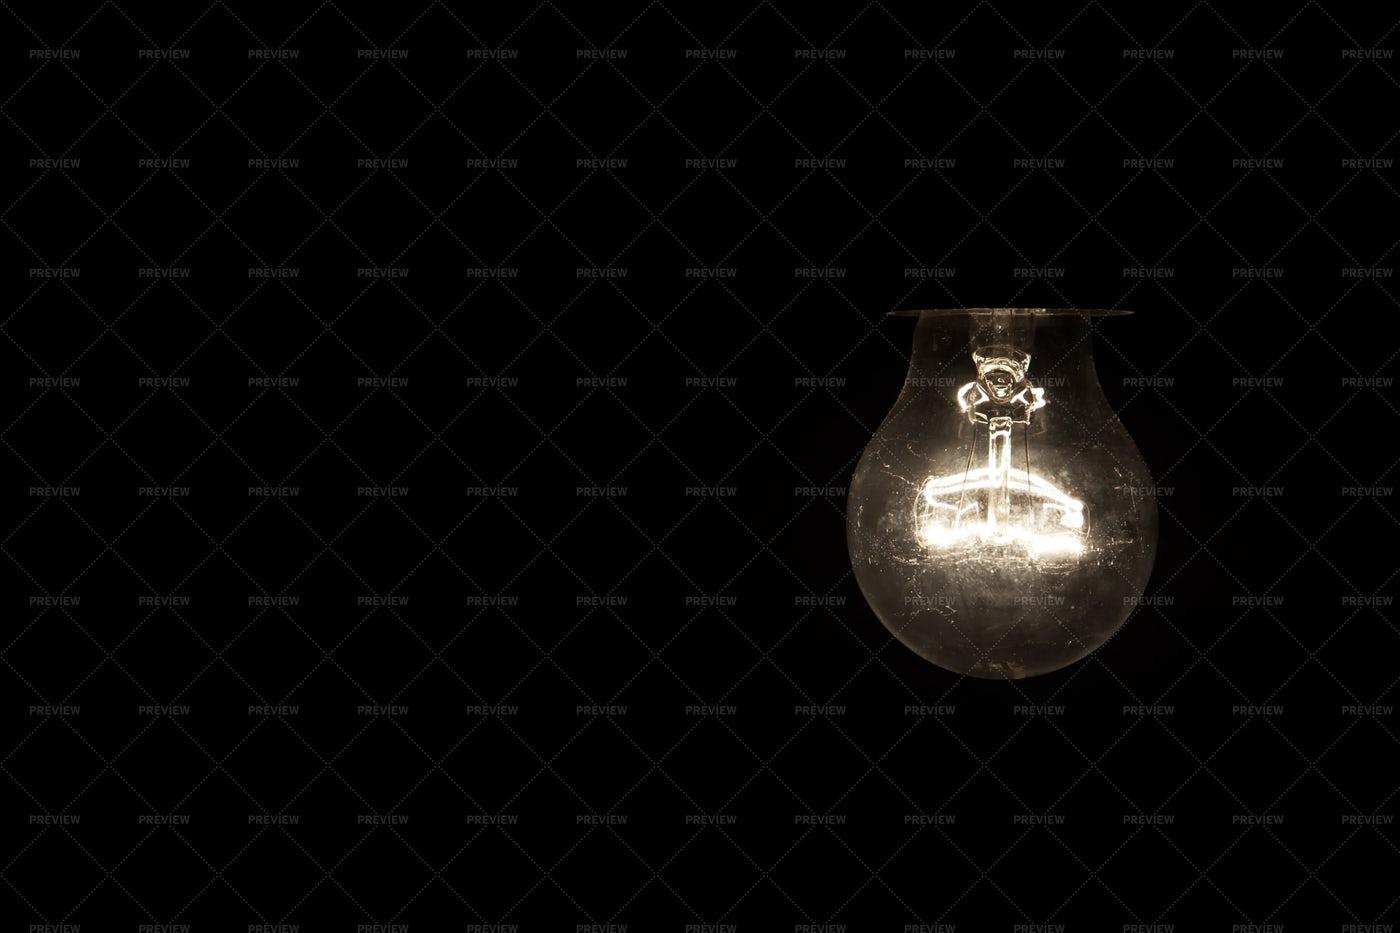 Vintage Light Bulb Glowing In Dark: Stock Photos